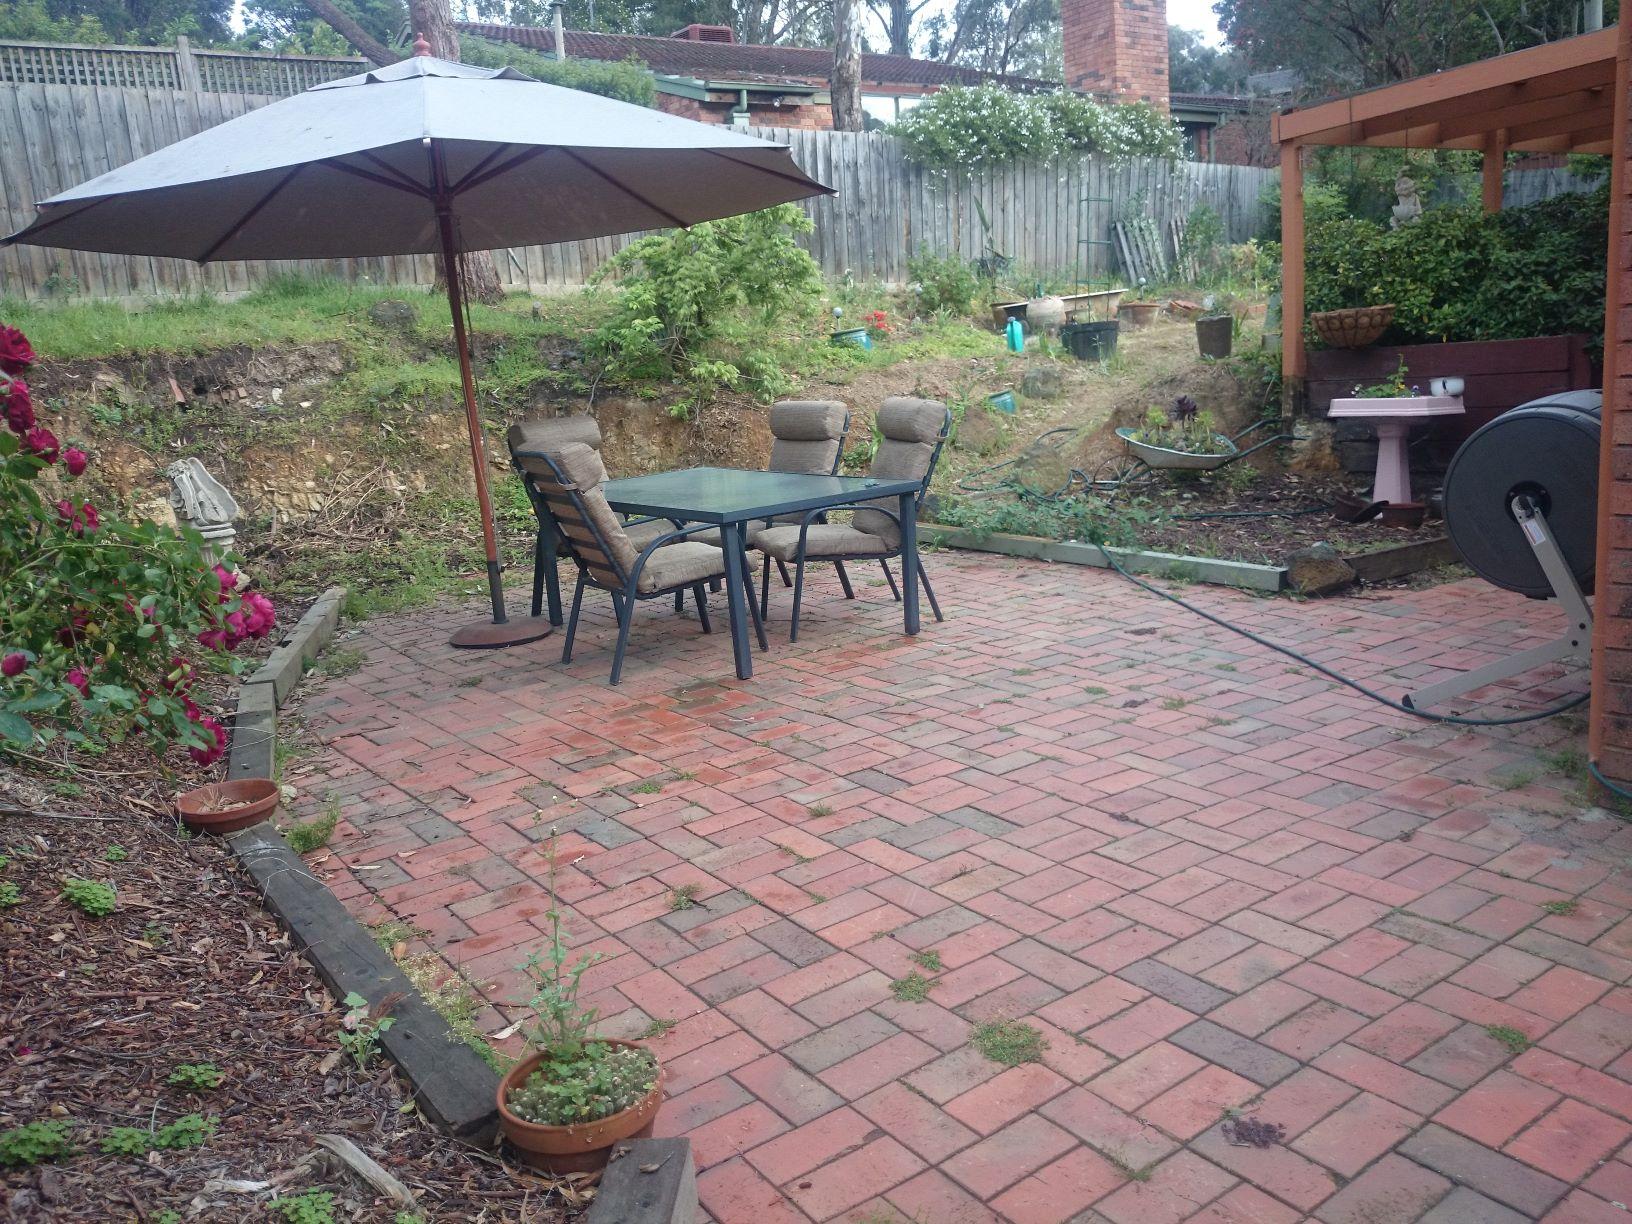 Before landscaping, Eltham entertaining area before works